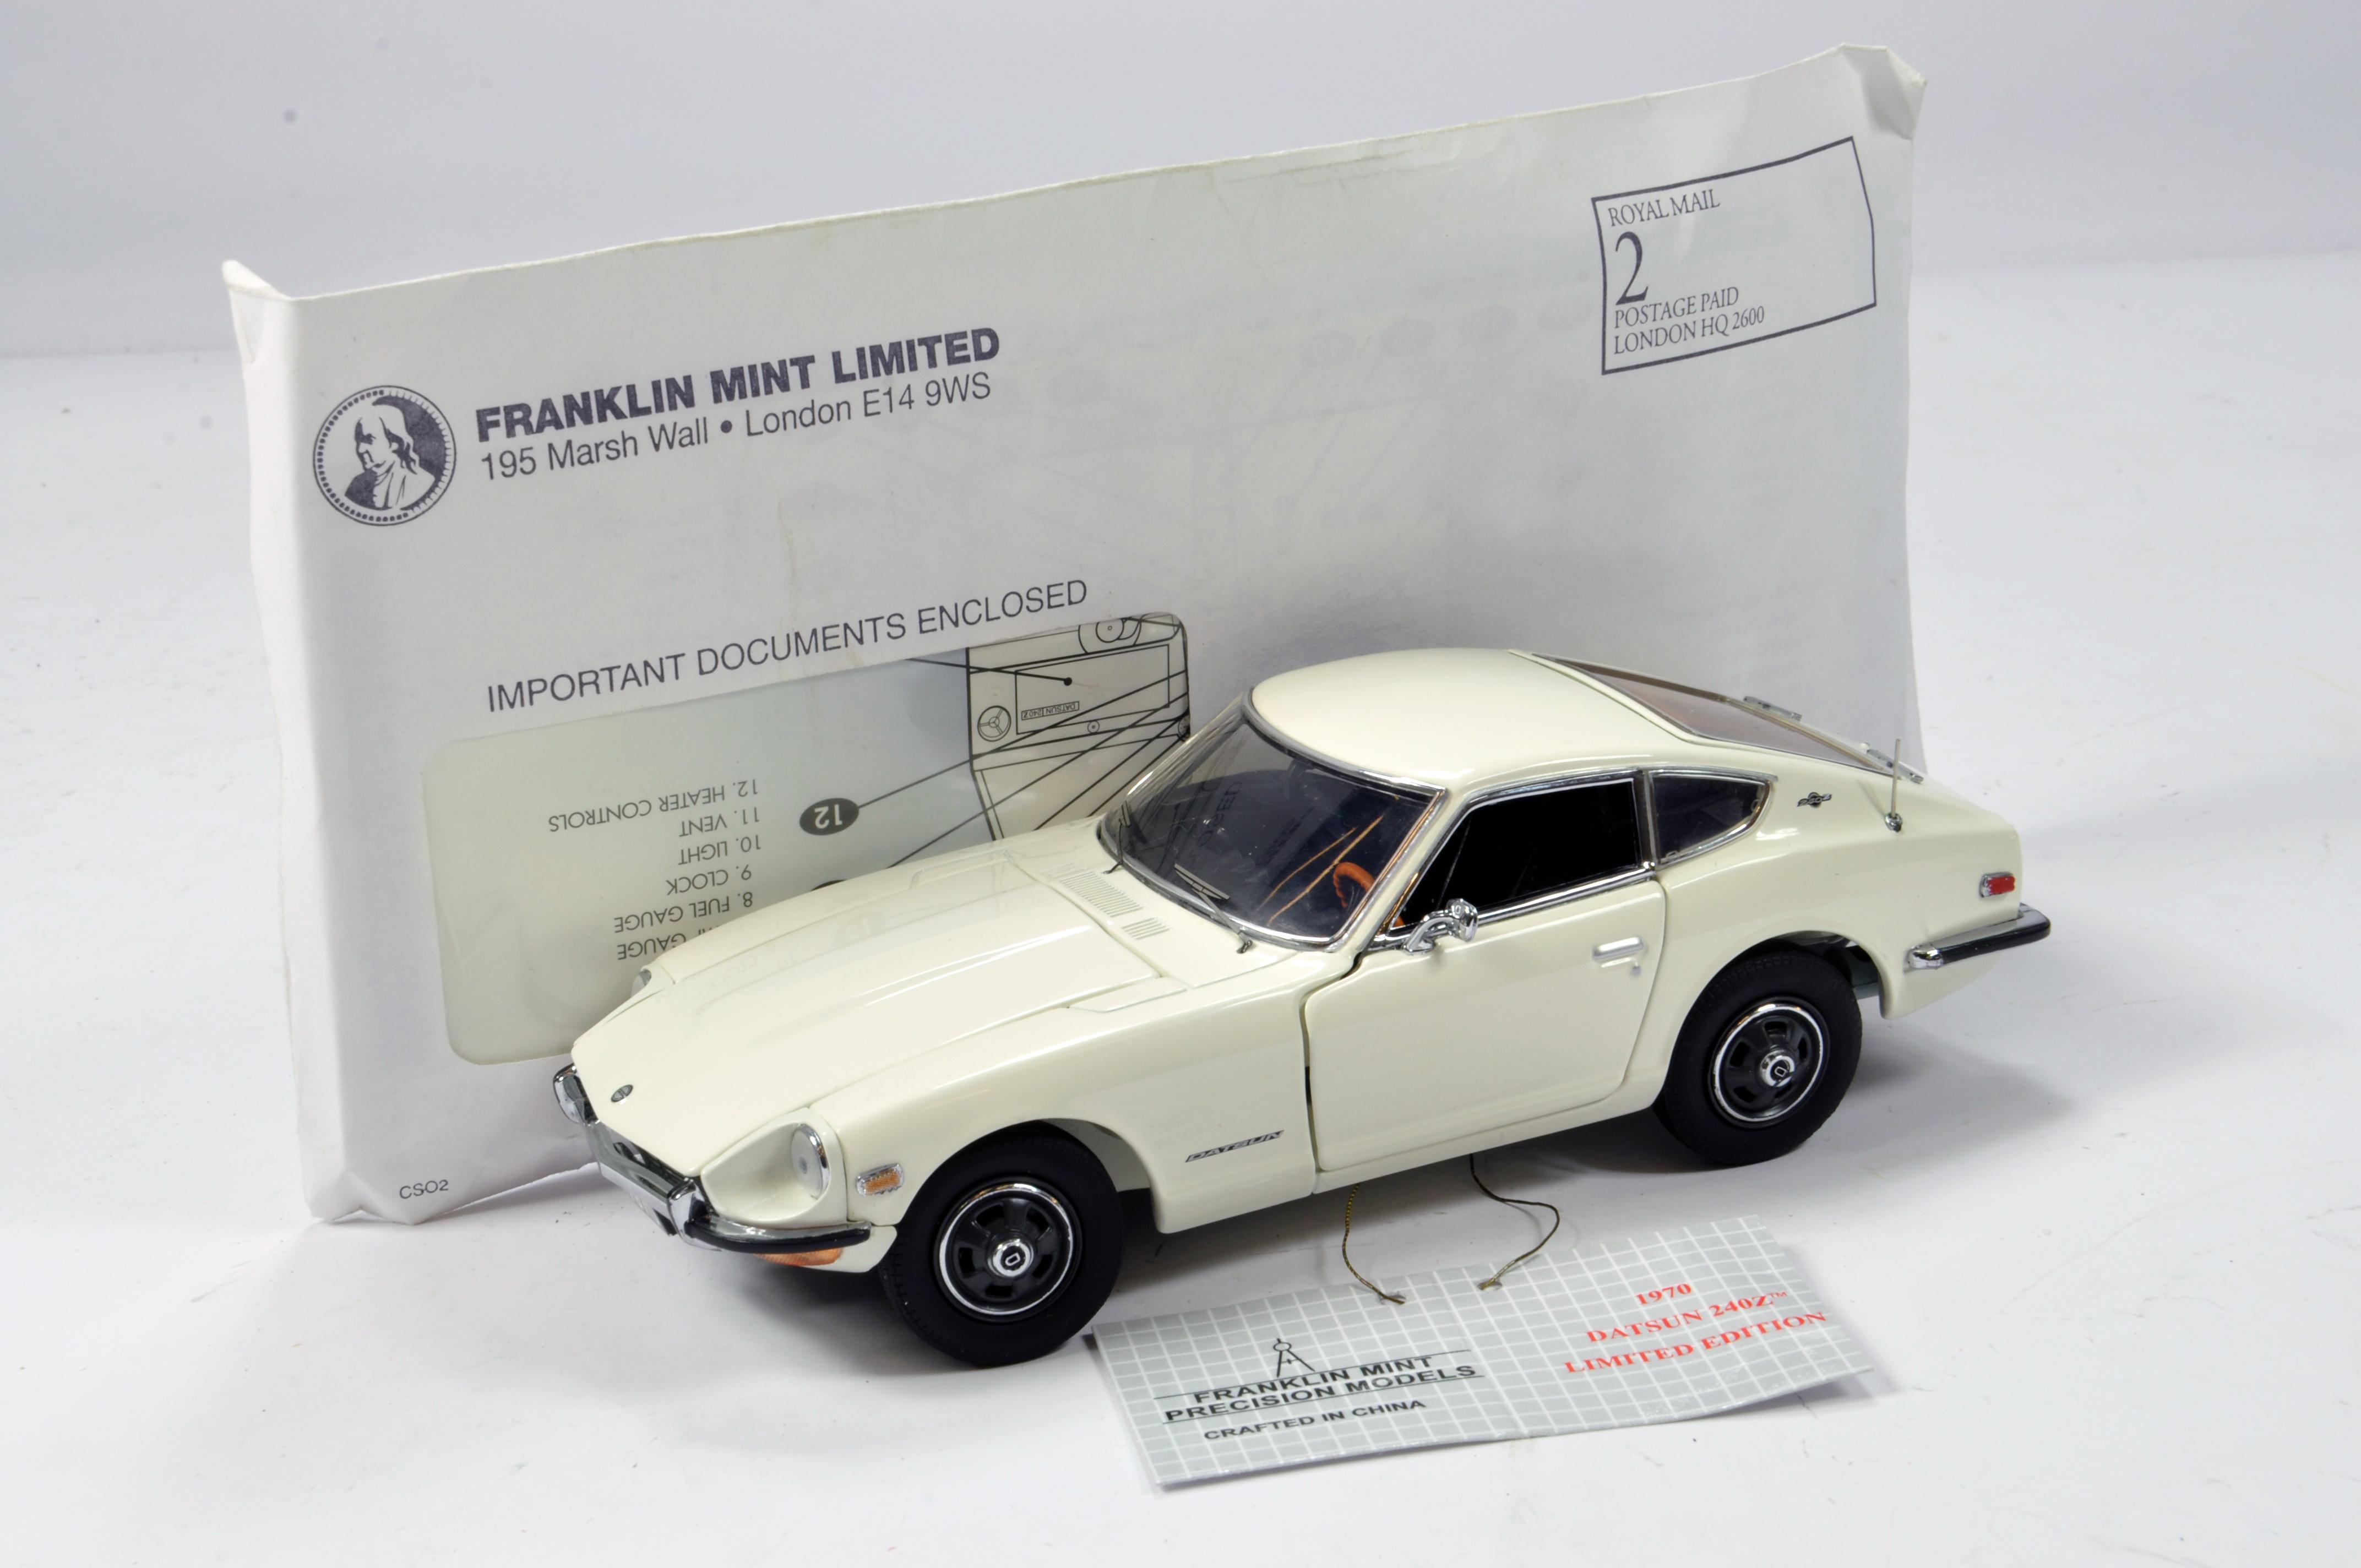 Lot 784 - Franklin Mint 1/24 Datsun 240Z (White) Limited Edition No. 01555/02500. E to NM.